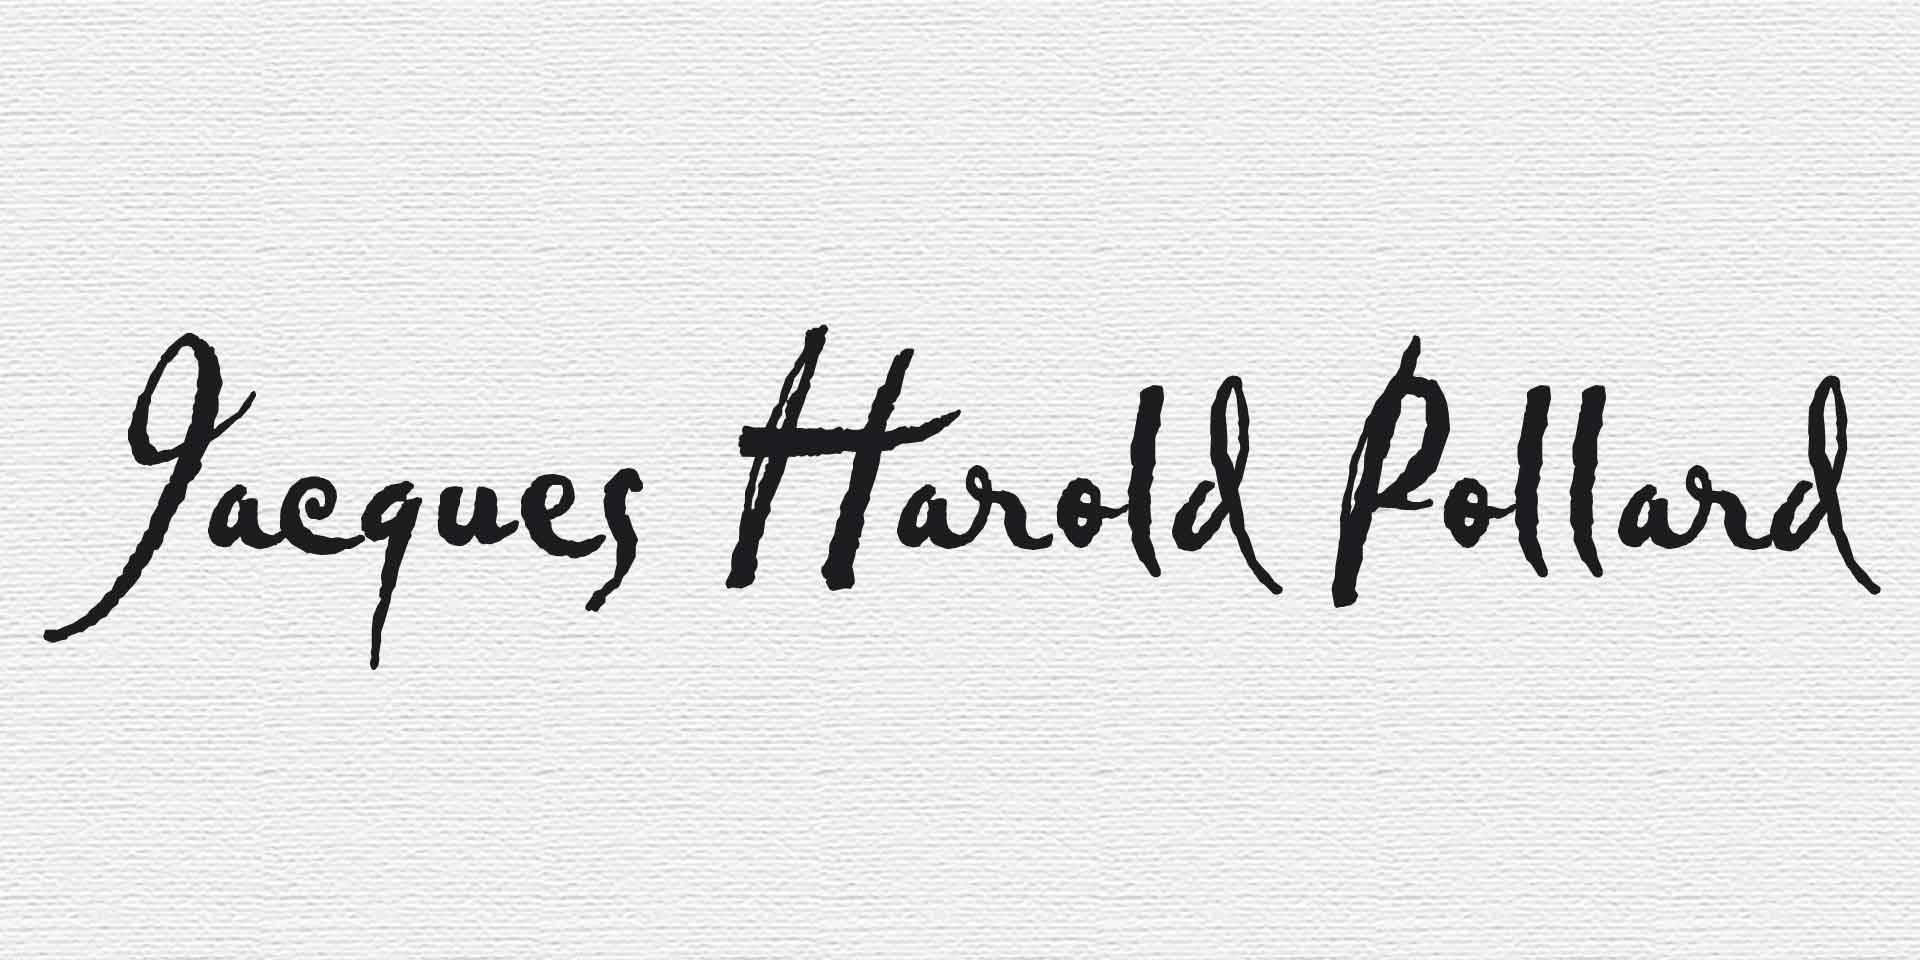 Jacques Harold Pollard